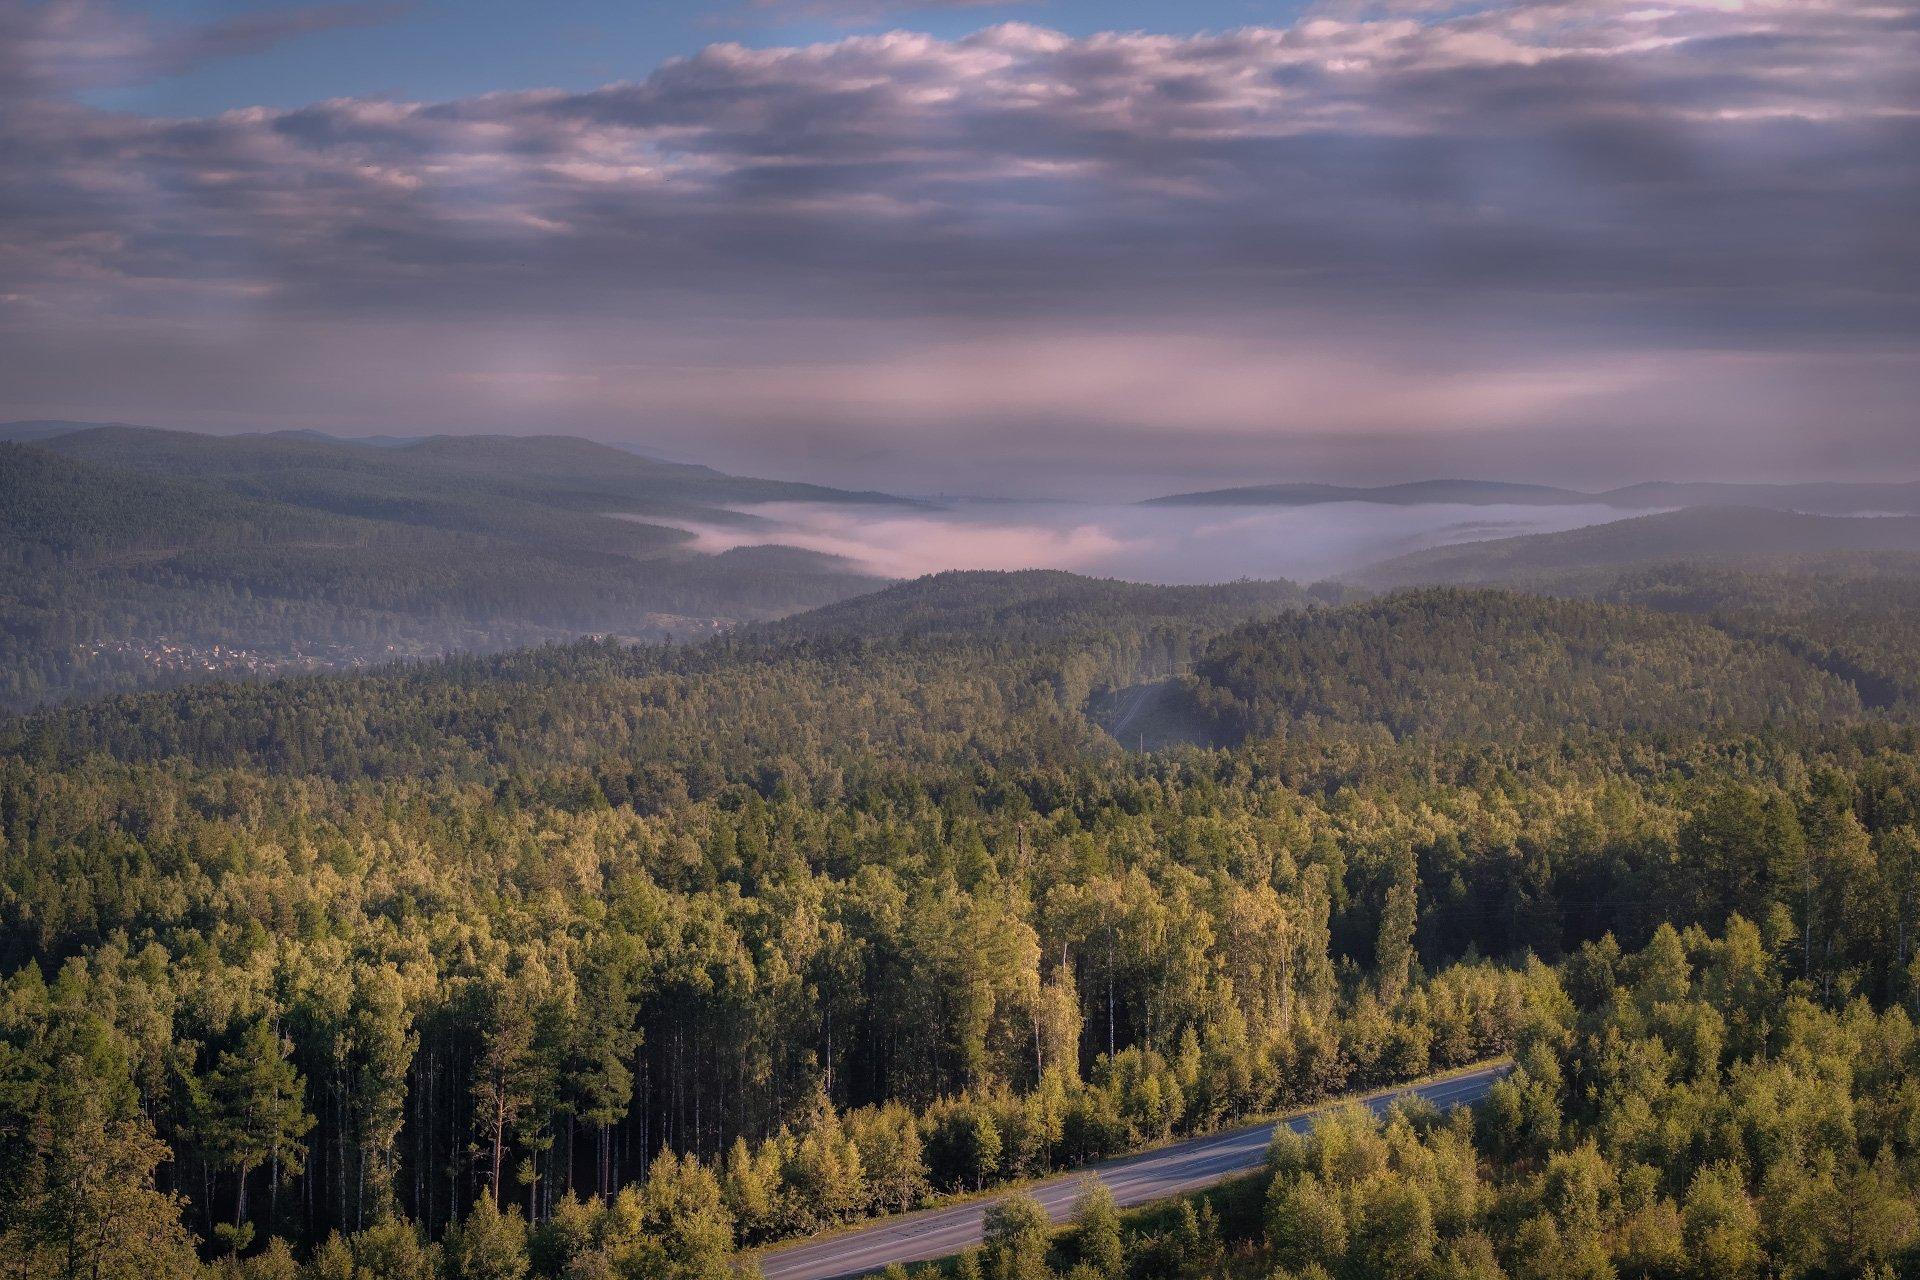 урал, бакал, седой, горы, туман, лес, тайга, дорога, путешествие, Андрей Чиж